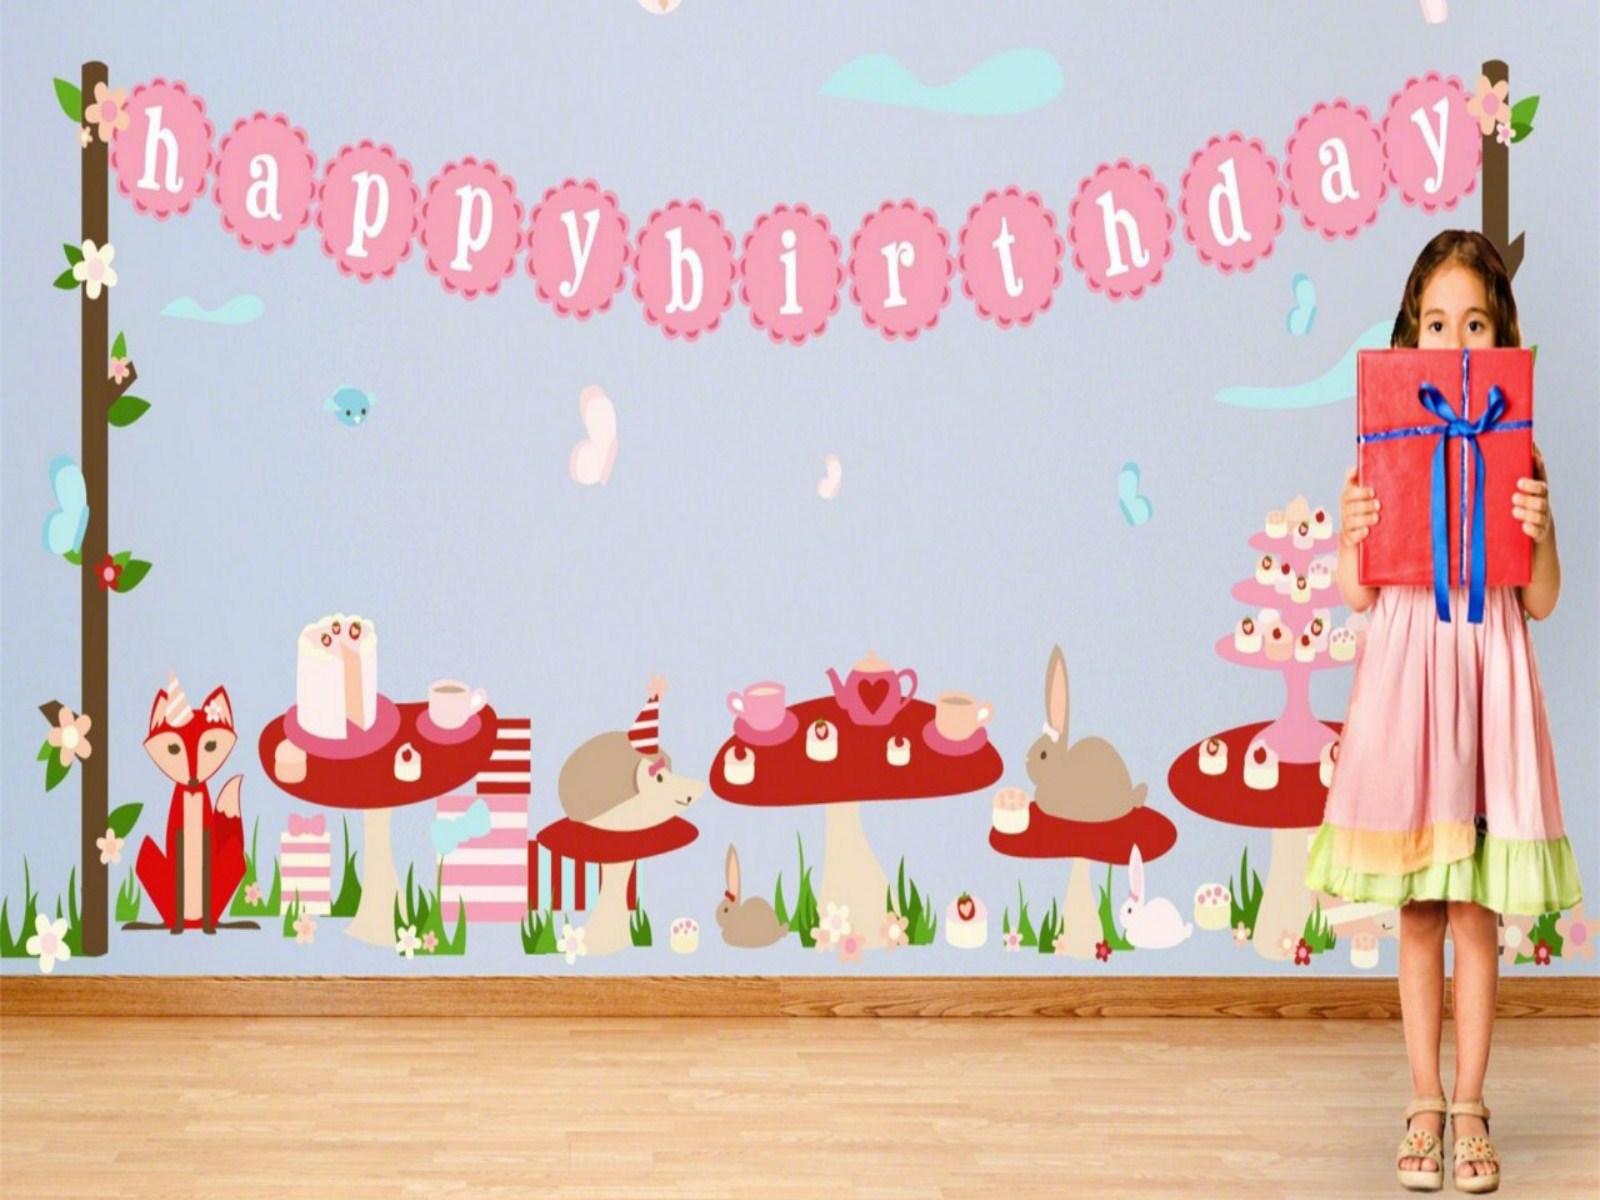 Birthday Party Wallpaper - WallpaperSafari